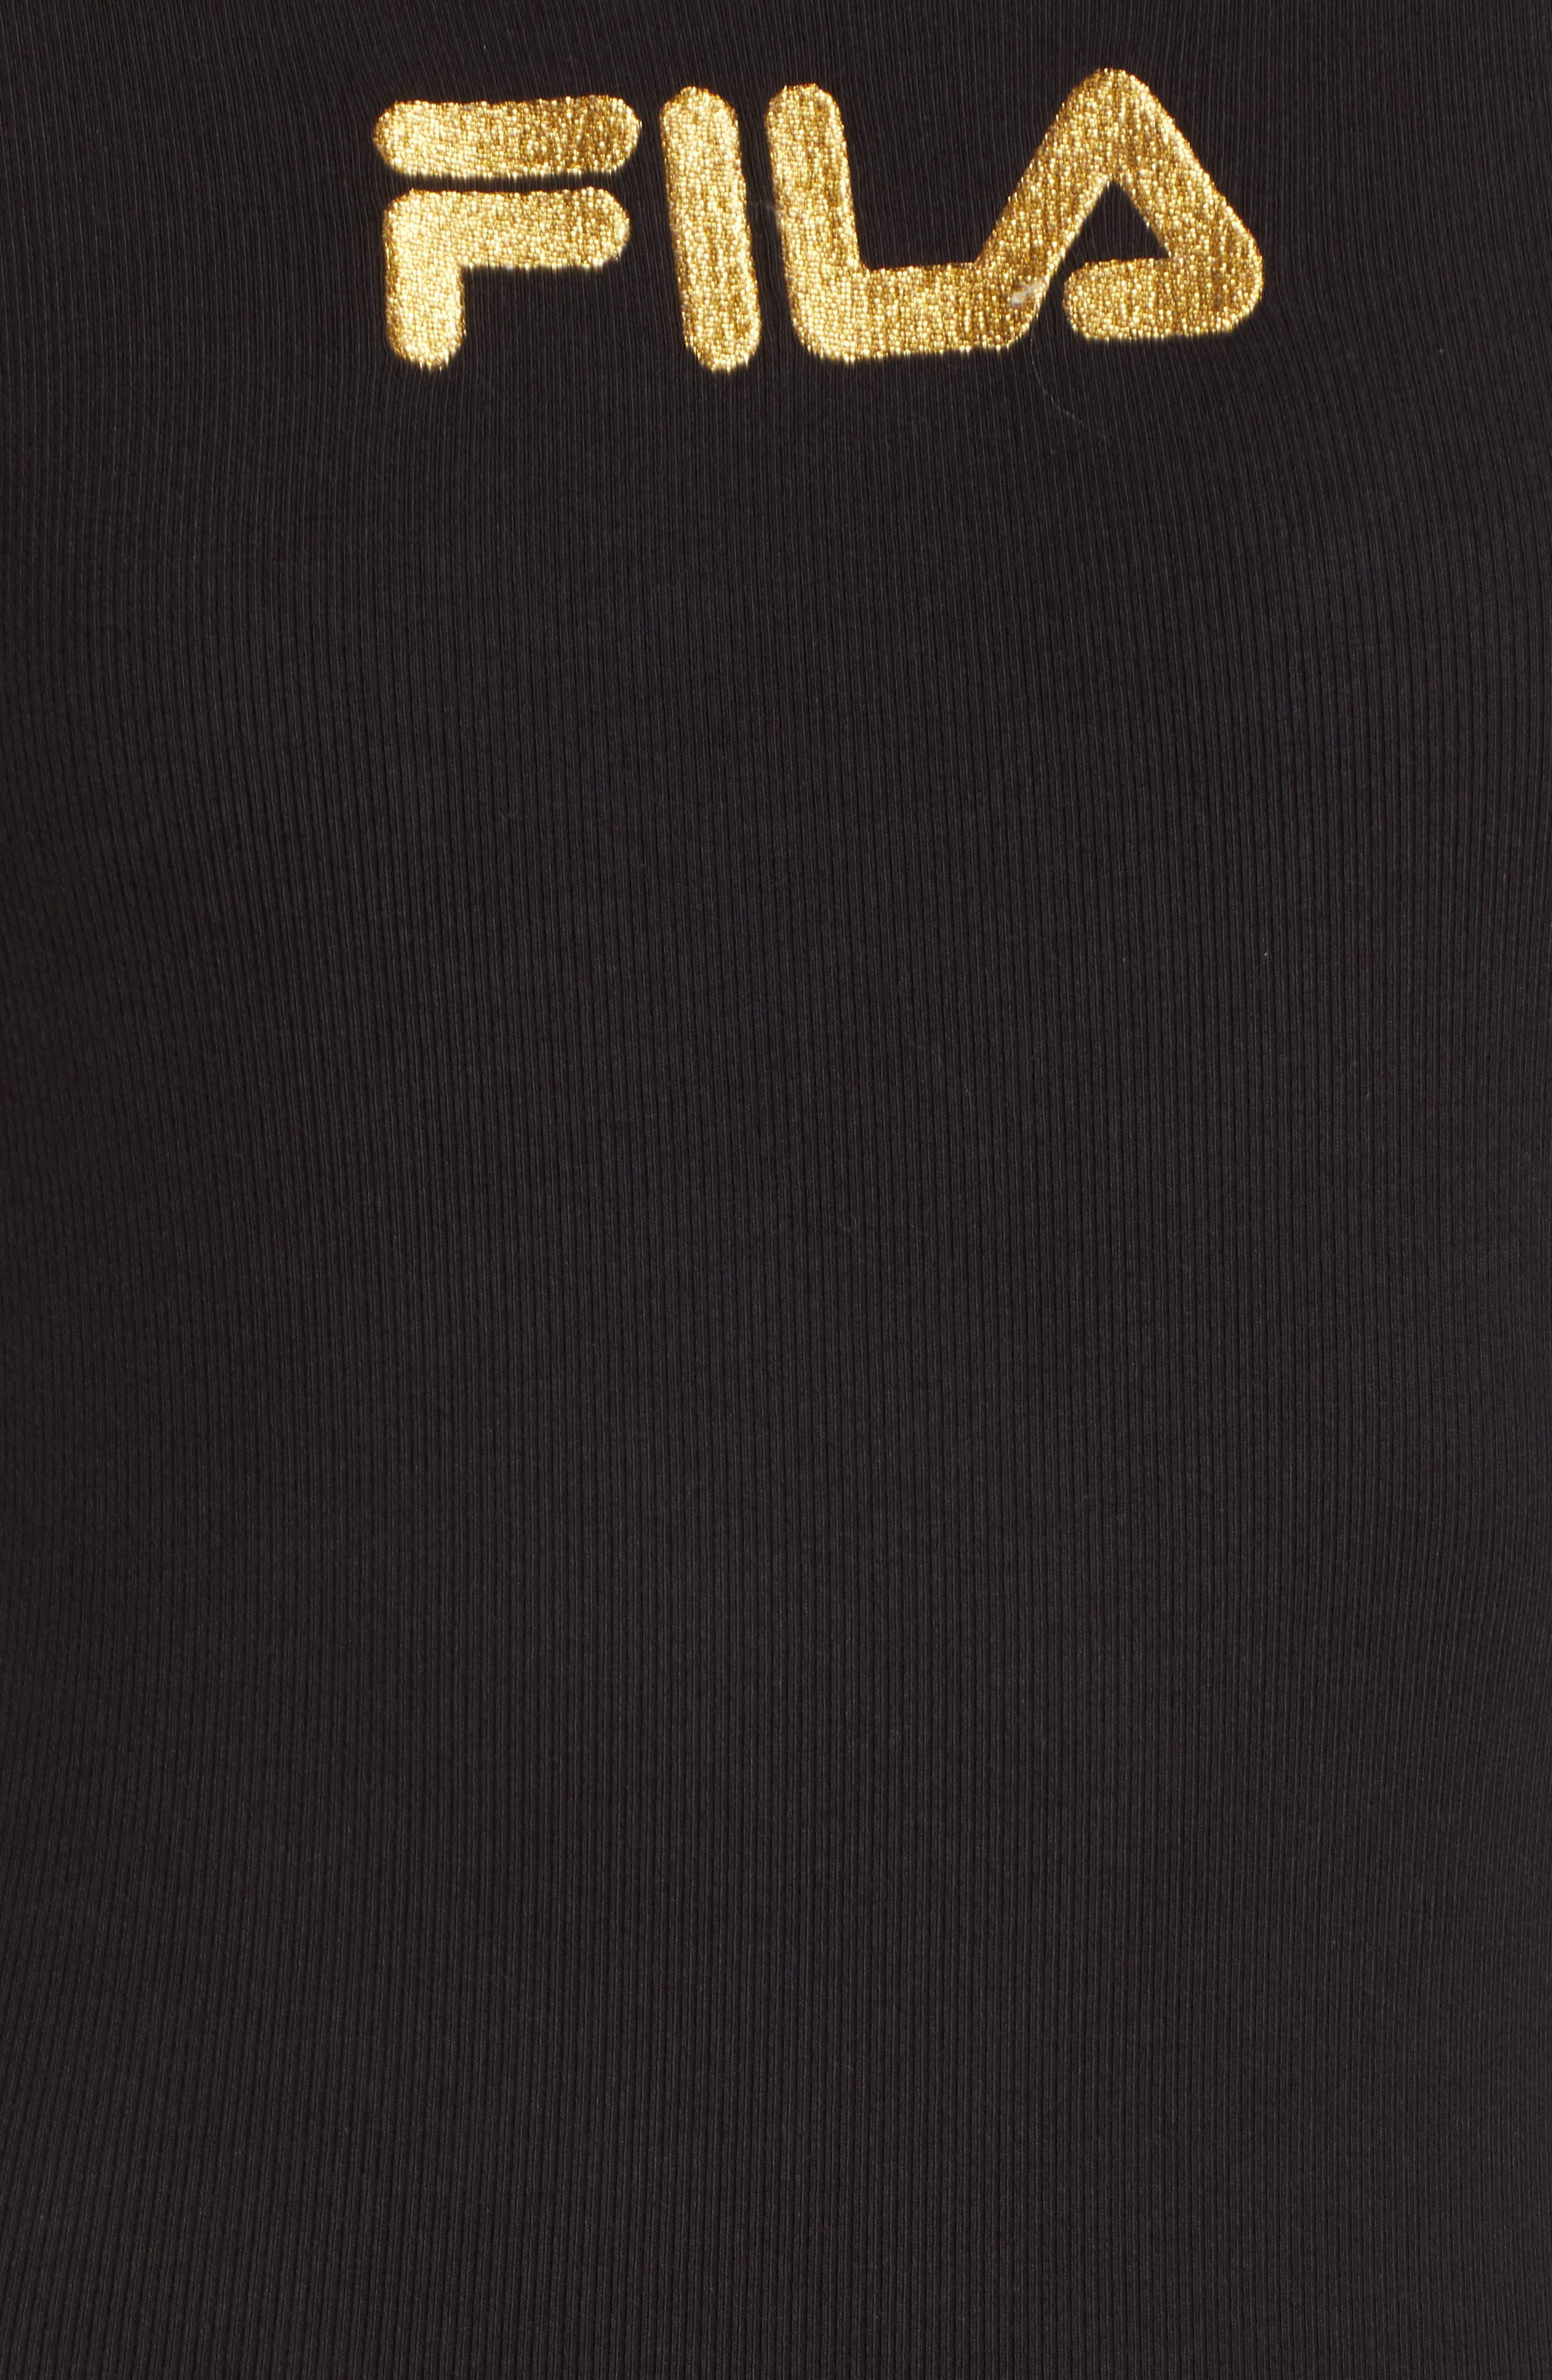 Ivory Unitard,                             Alternate thumbnail 6, color,                             Black/ White